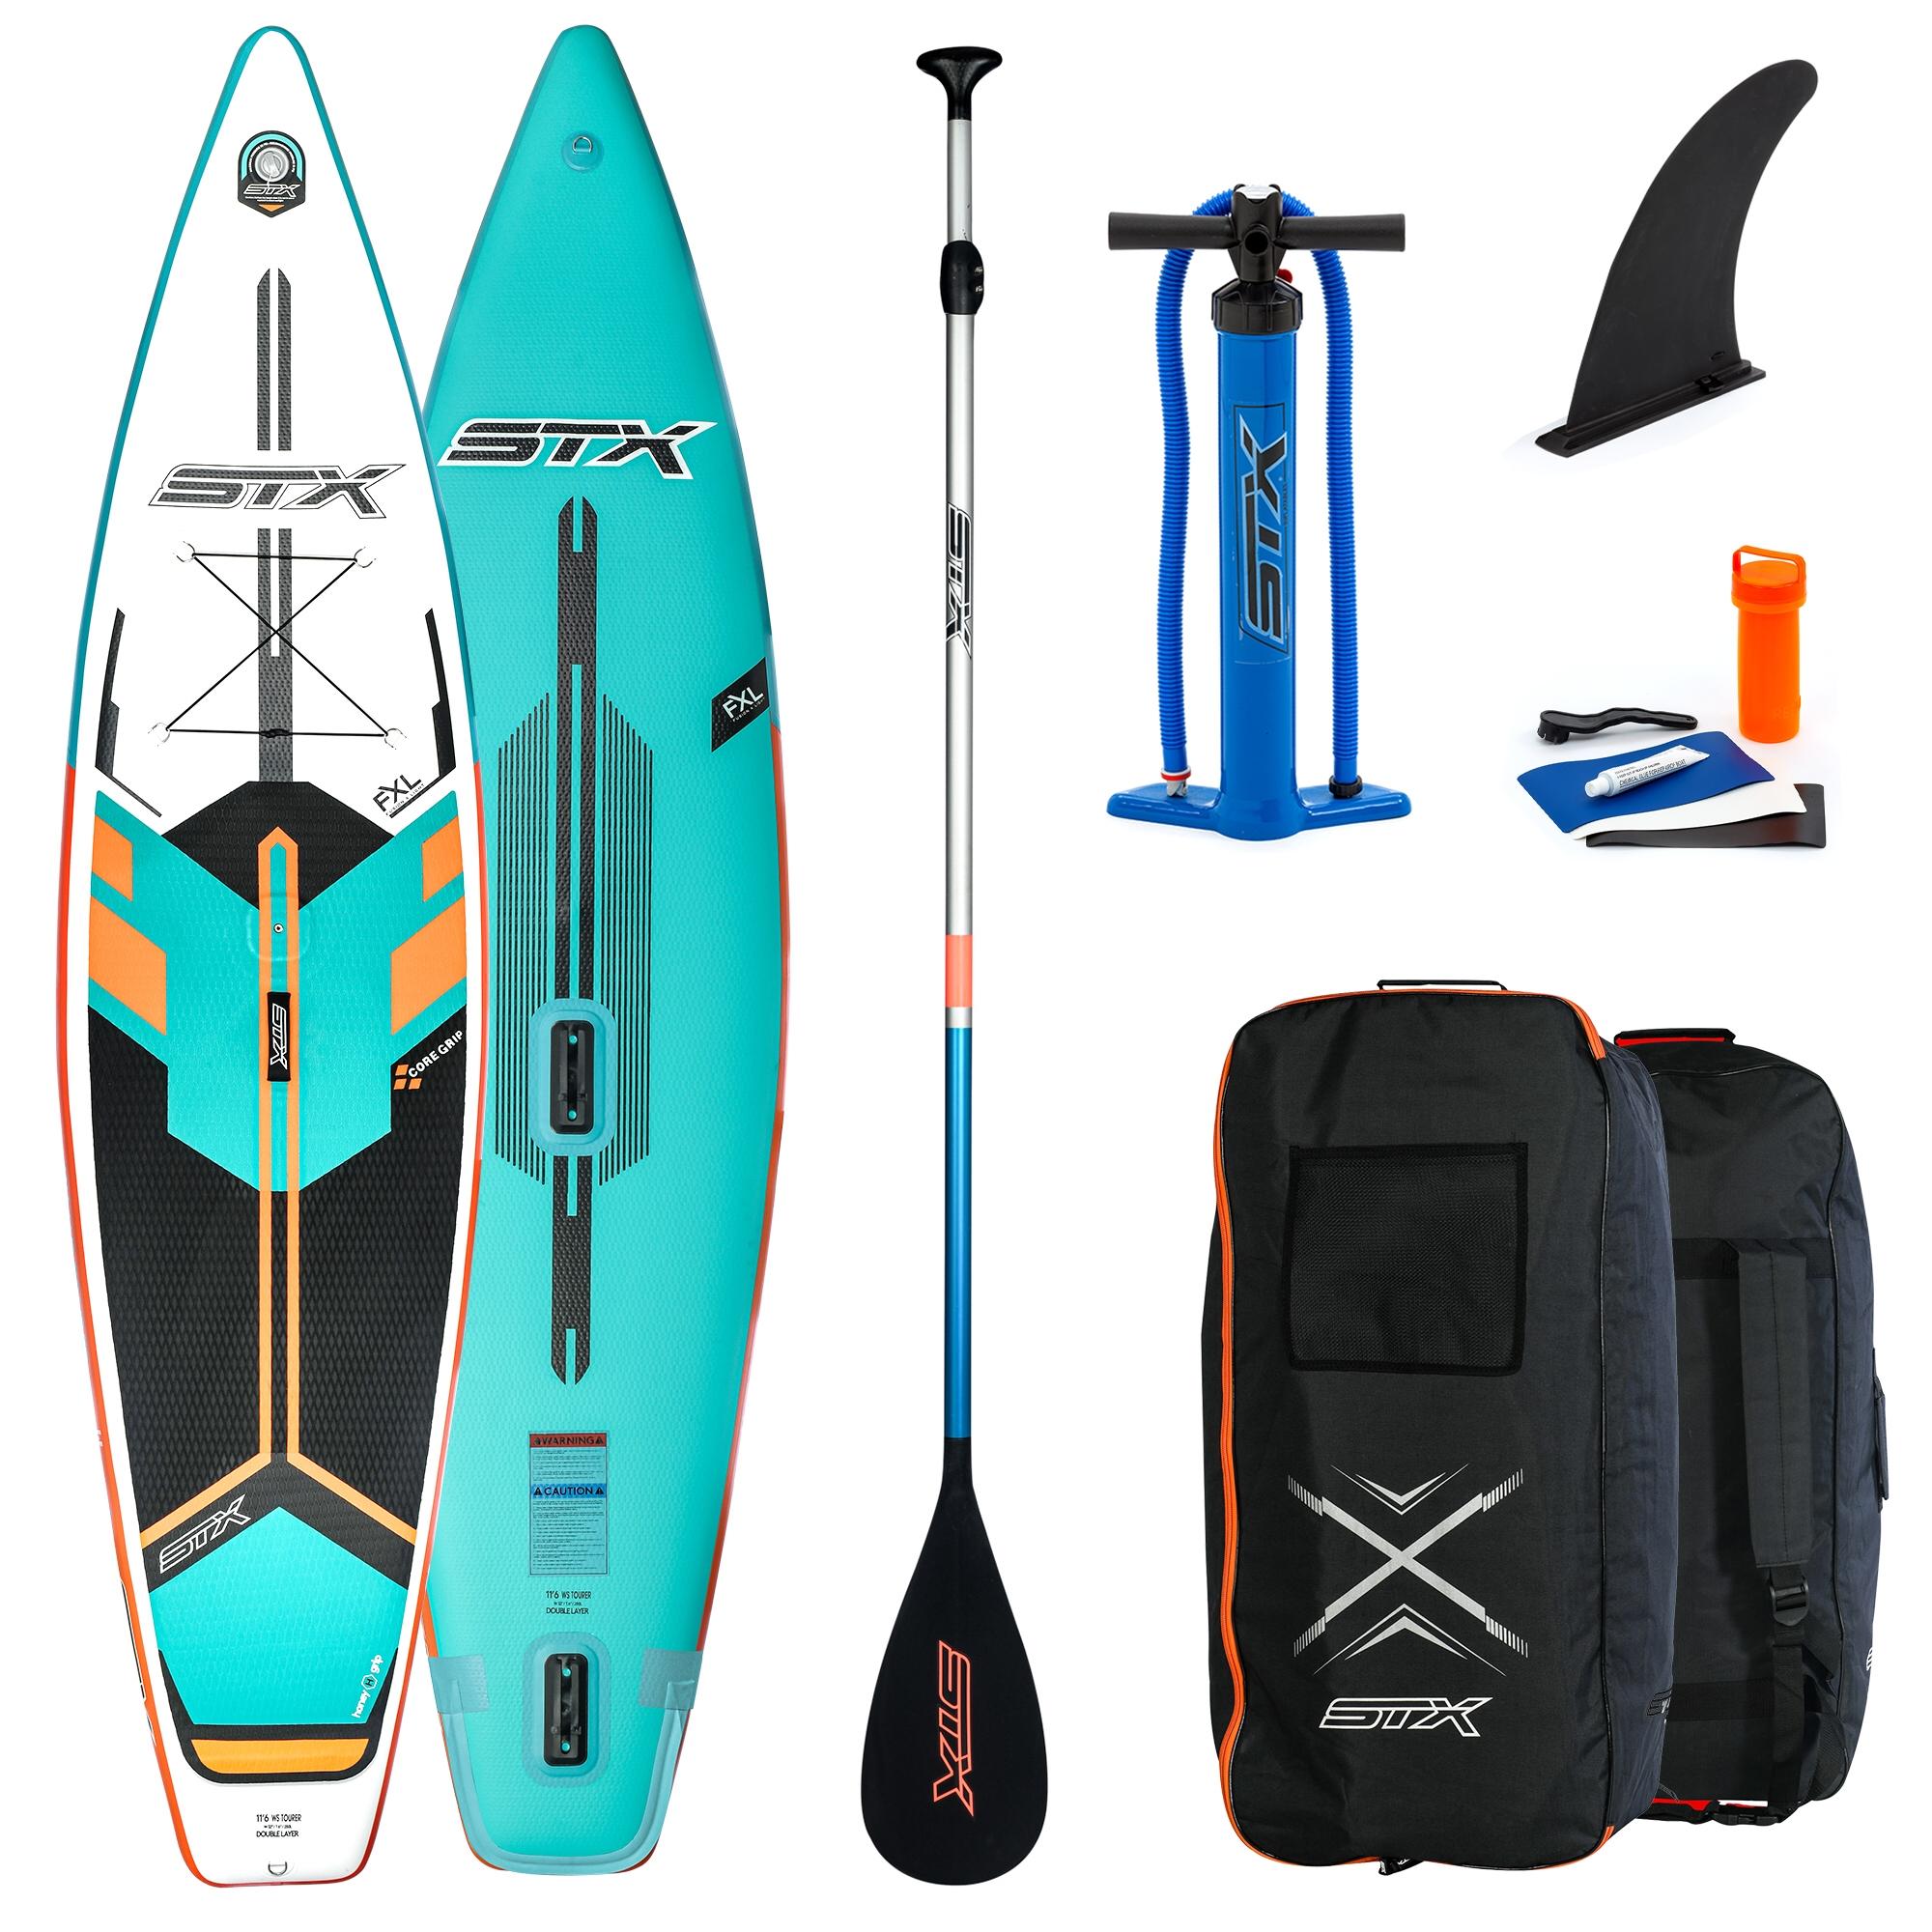 Paddleboard_STX_SUP_11_6_tourer_mint_orange_set